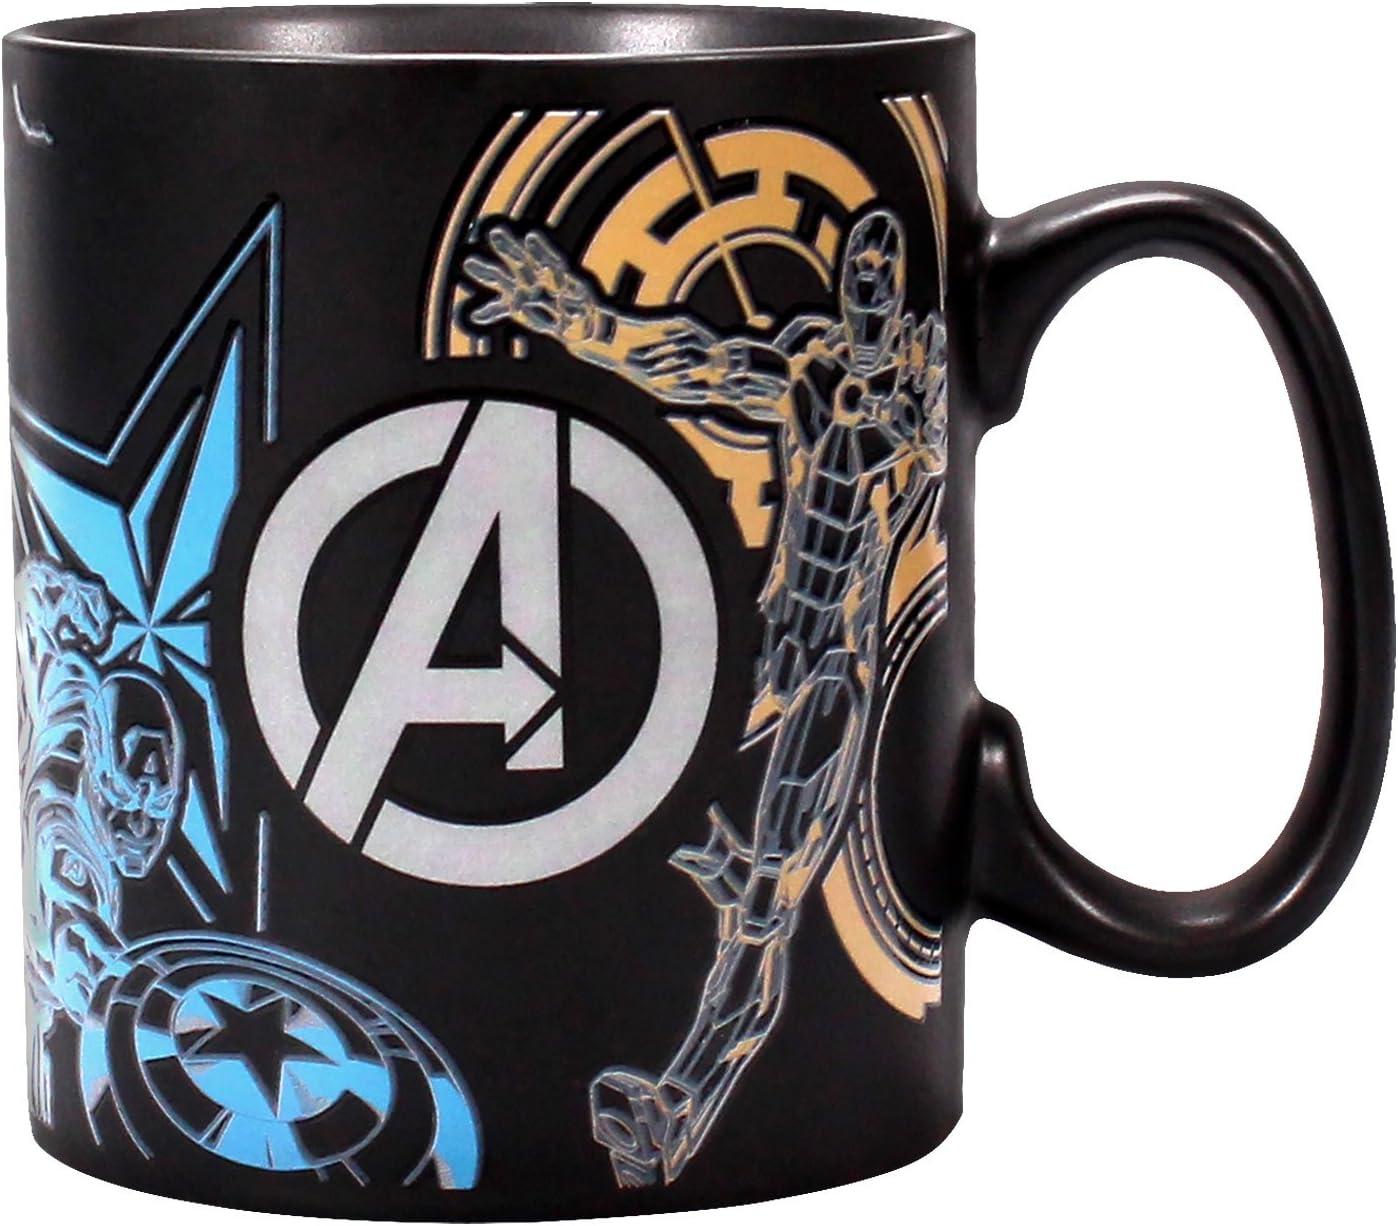 Heat Changing Mug Marvel Avengers-Heroes Coffee Tea Original Licensed Product